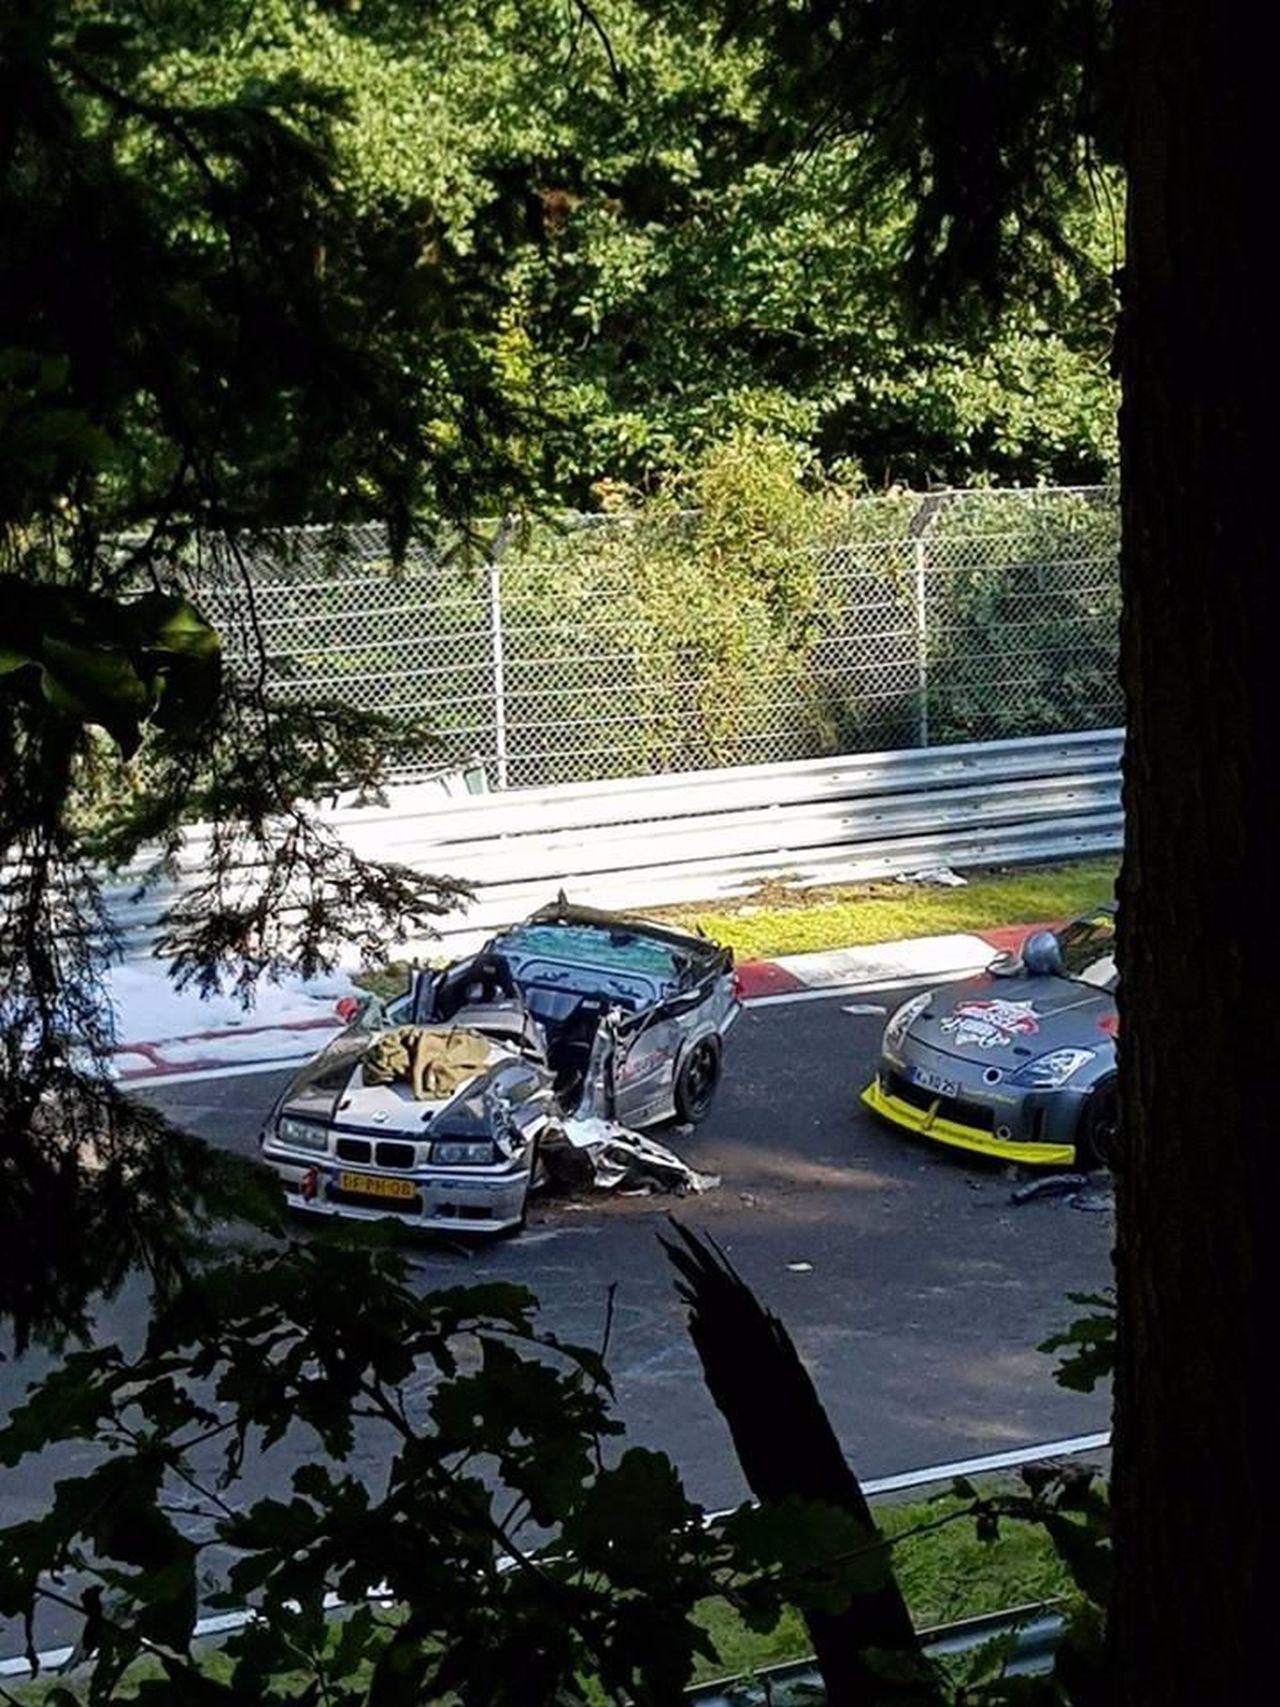 Nurburgring crash august 2017 (7)